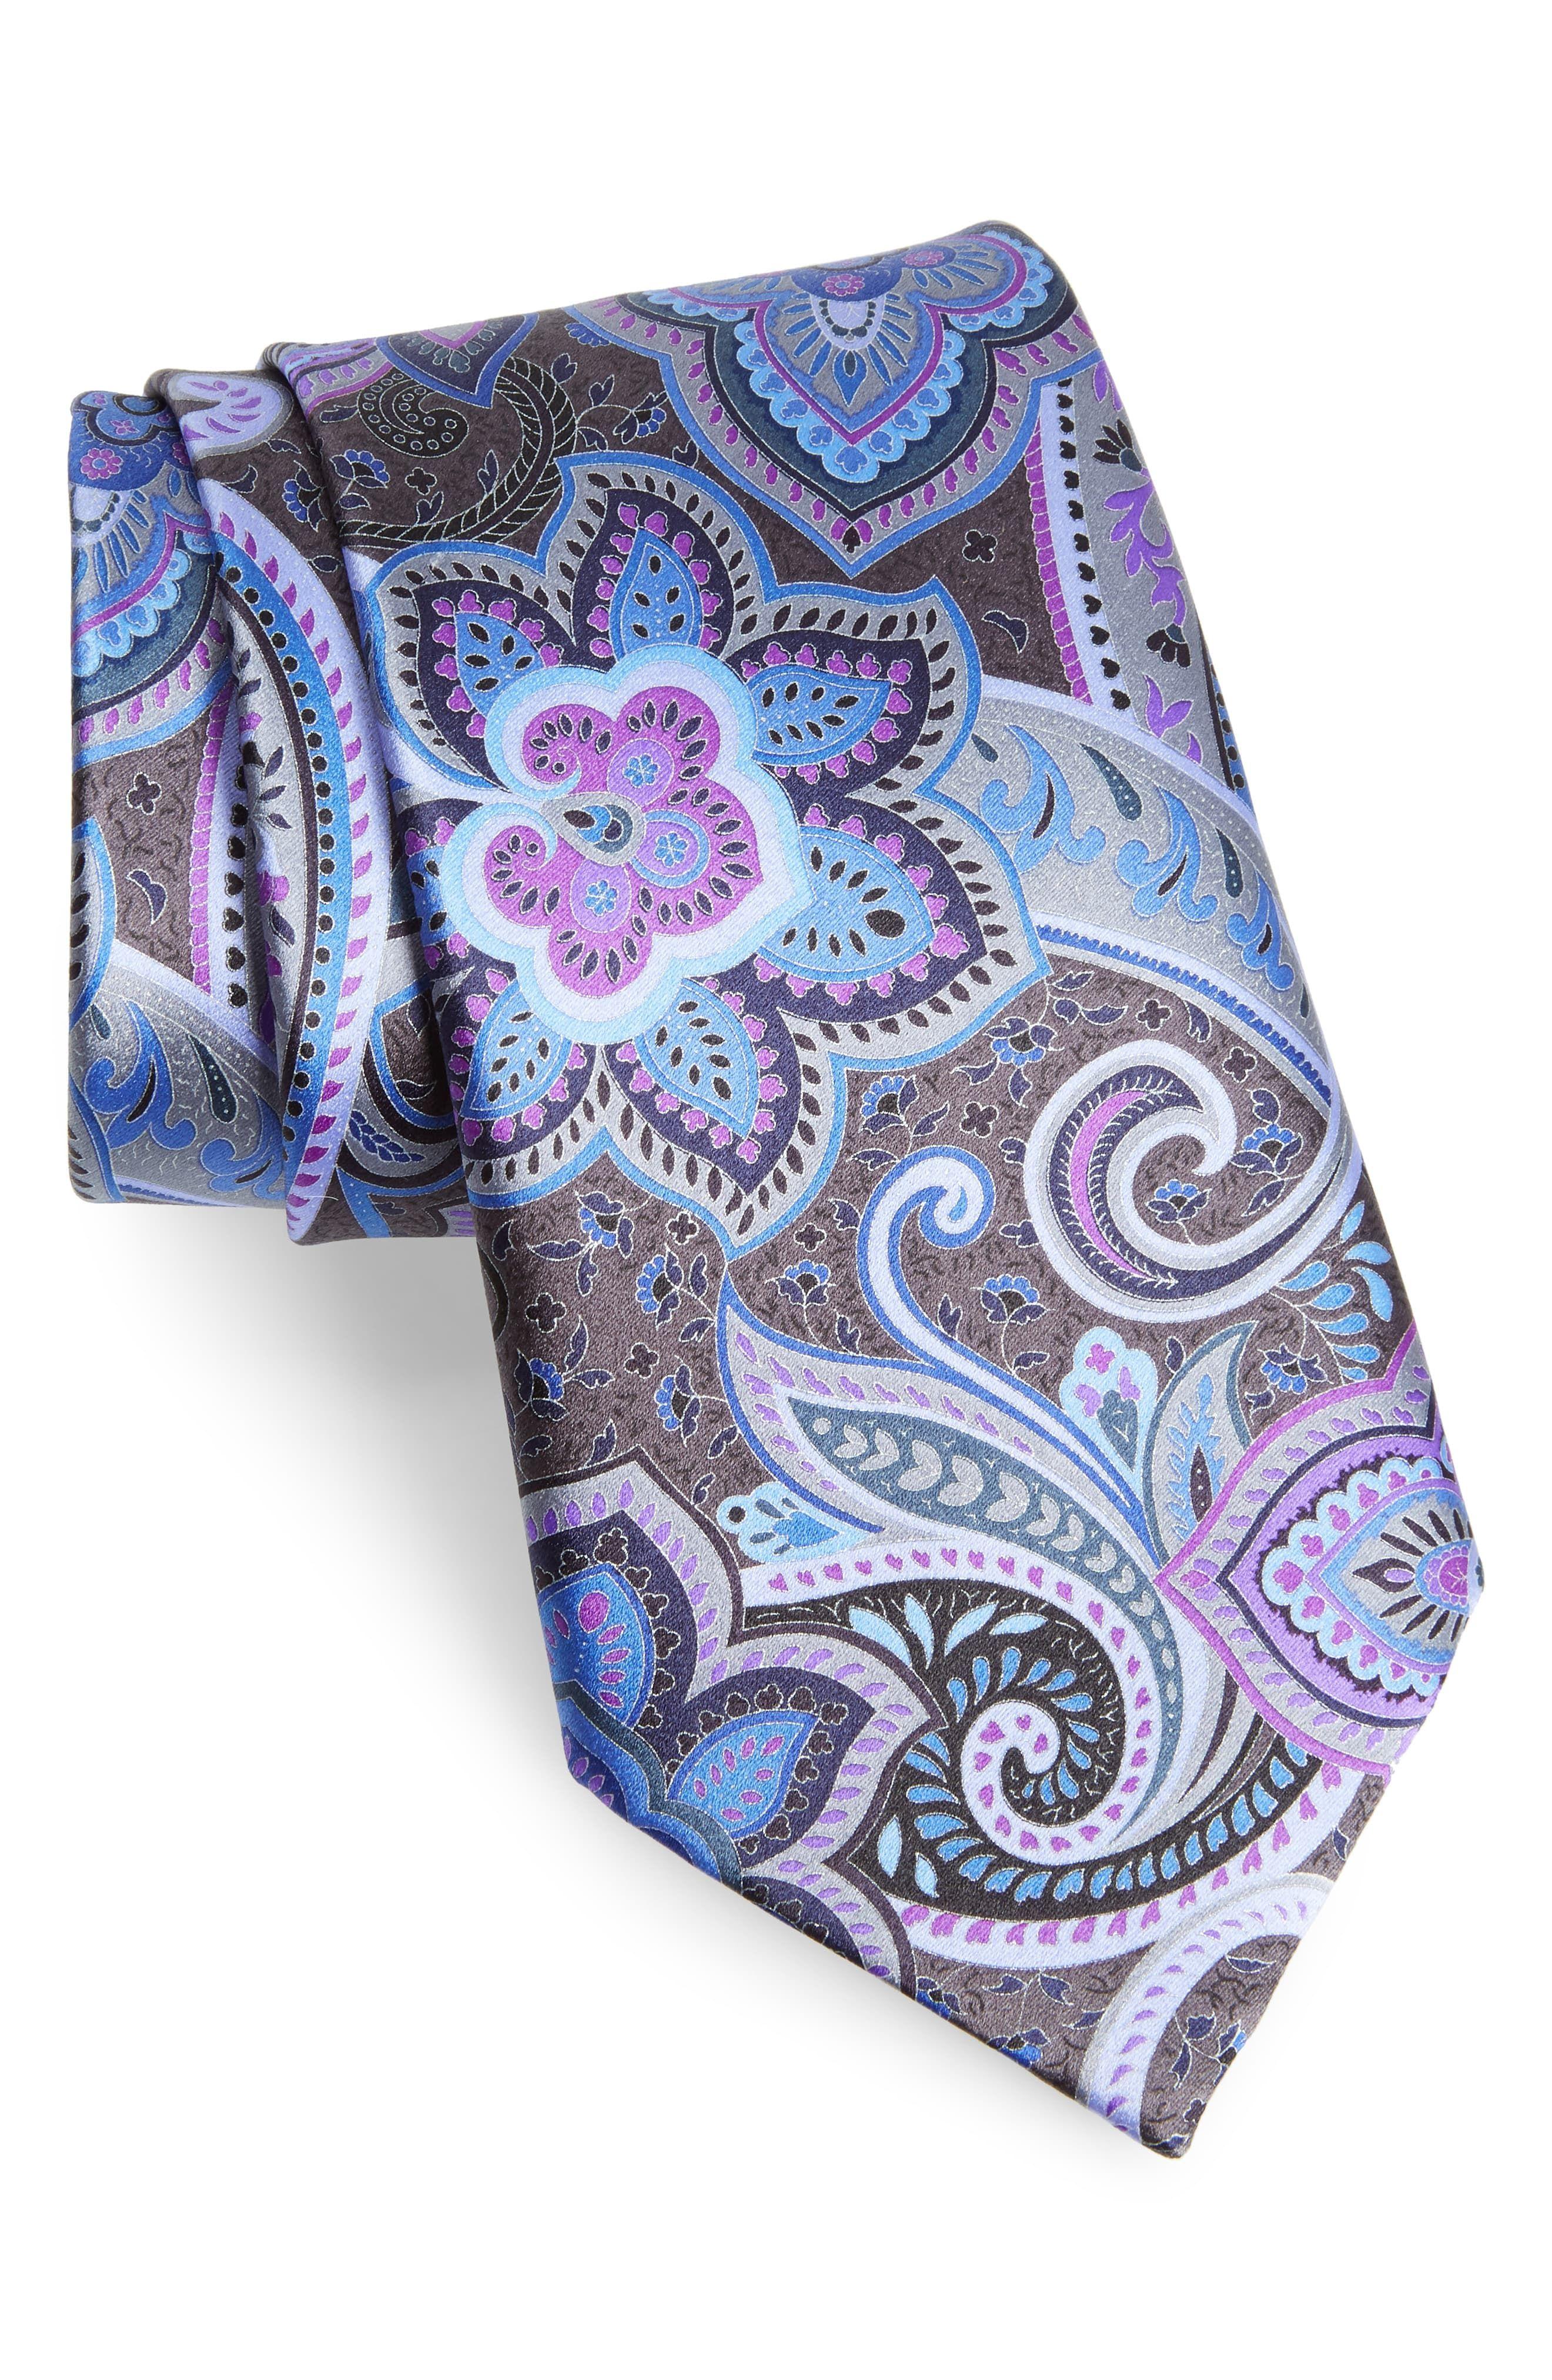 fb5e9d40 Men's Ermenegildo Zegna Quindici Floral Paisley Silk Tie, Size ...